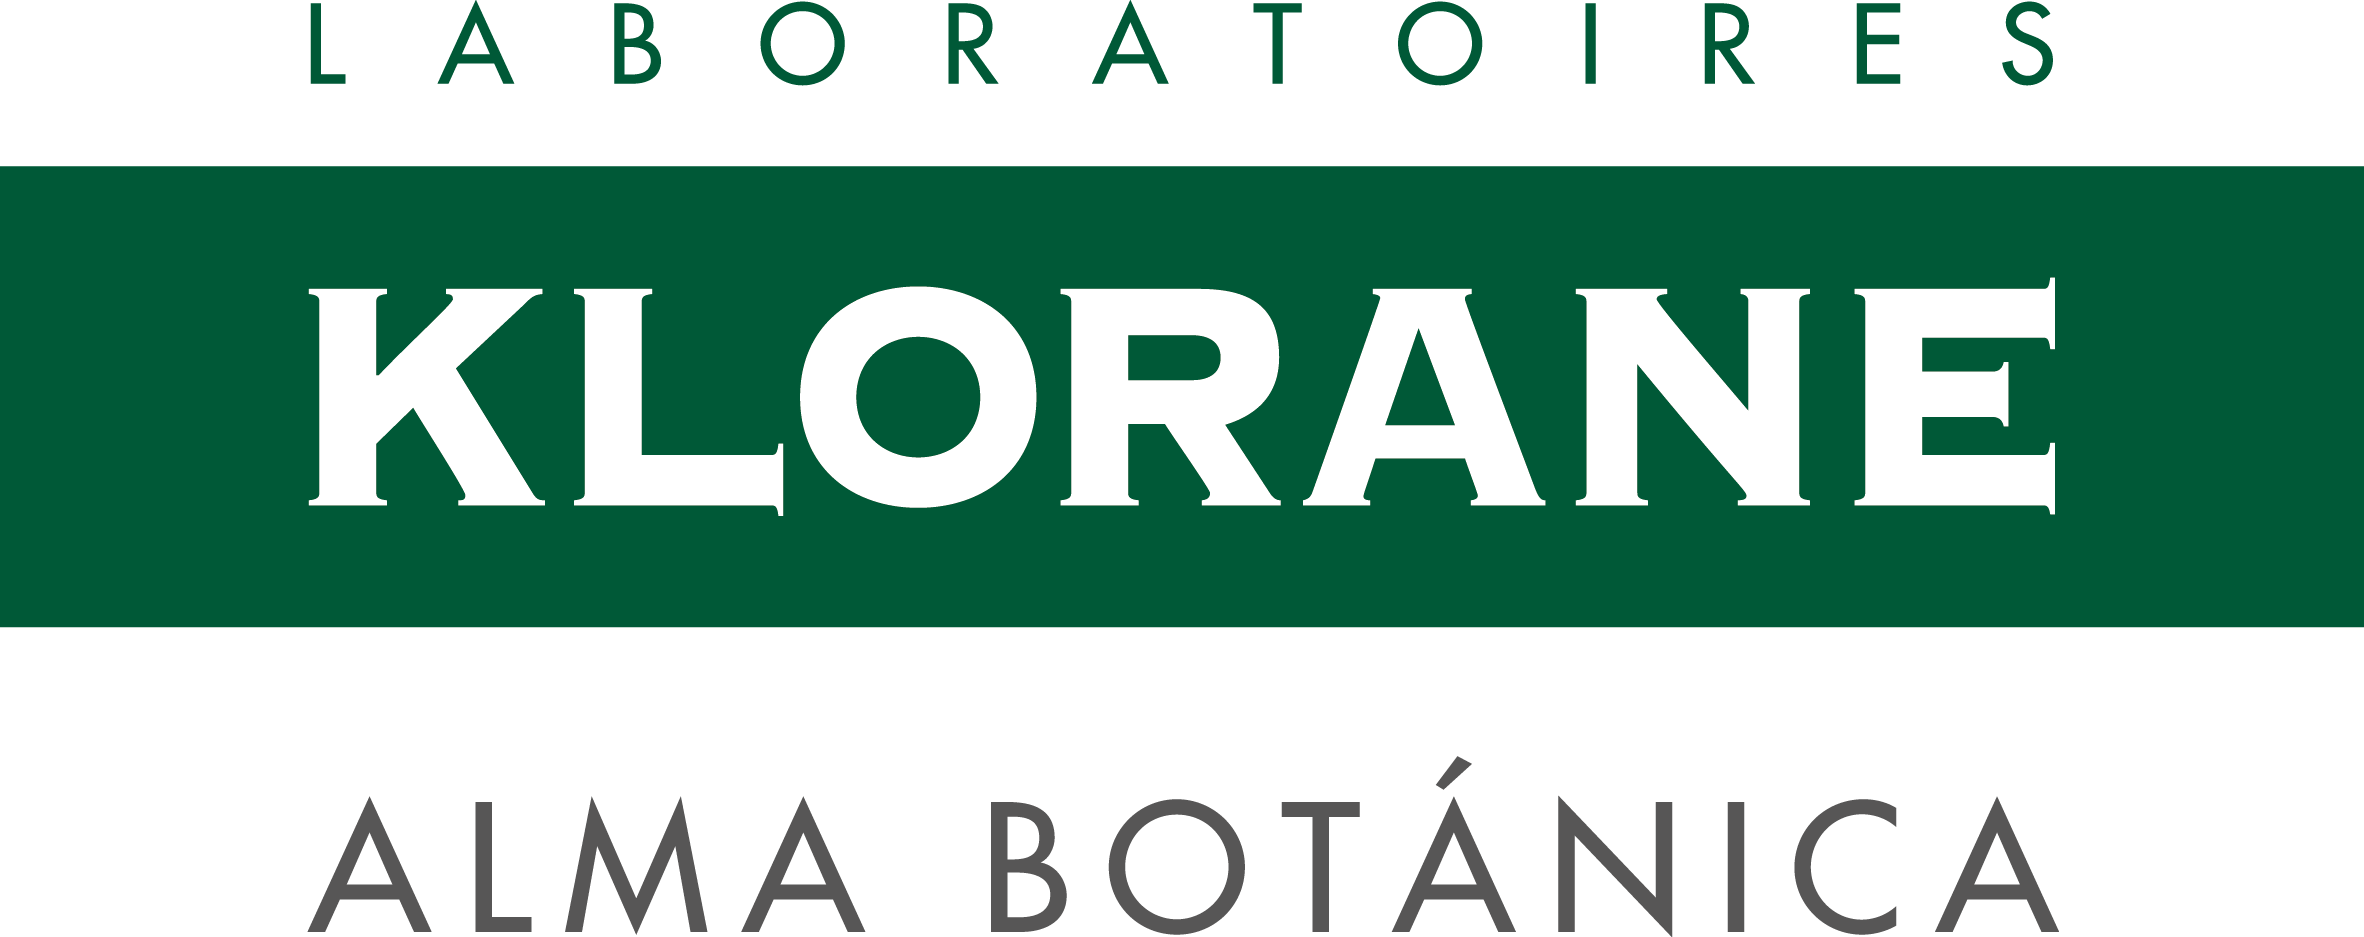 Laboratorios Klorane